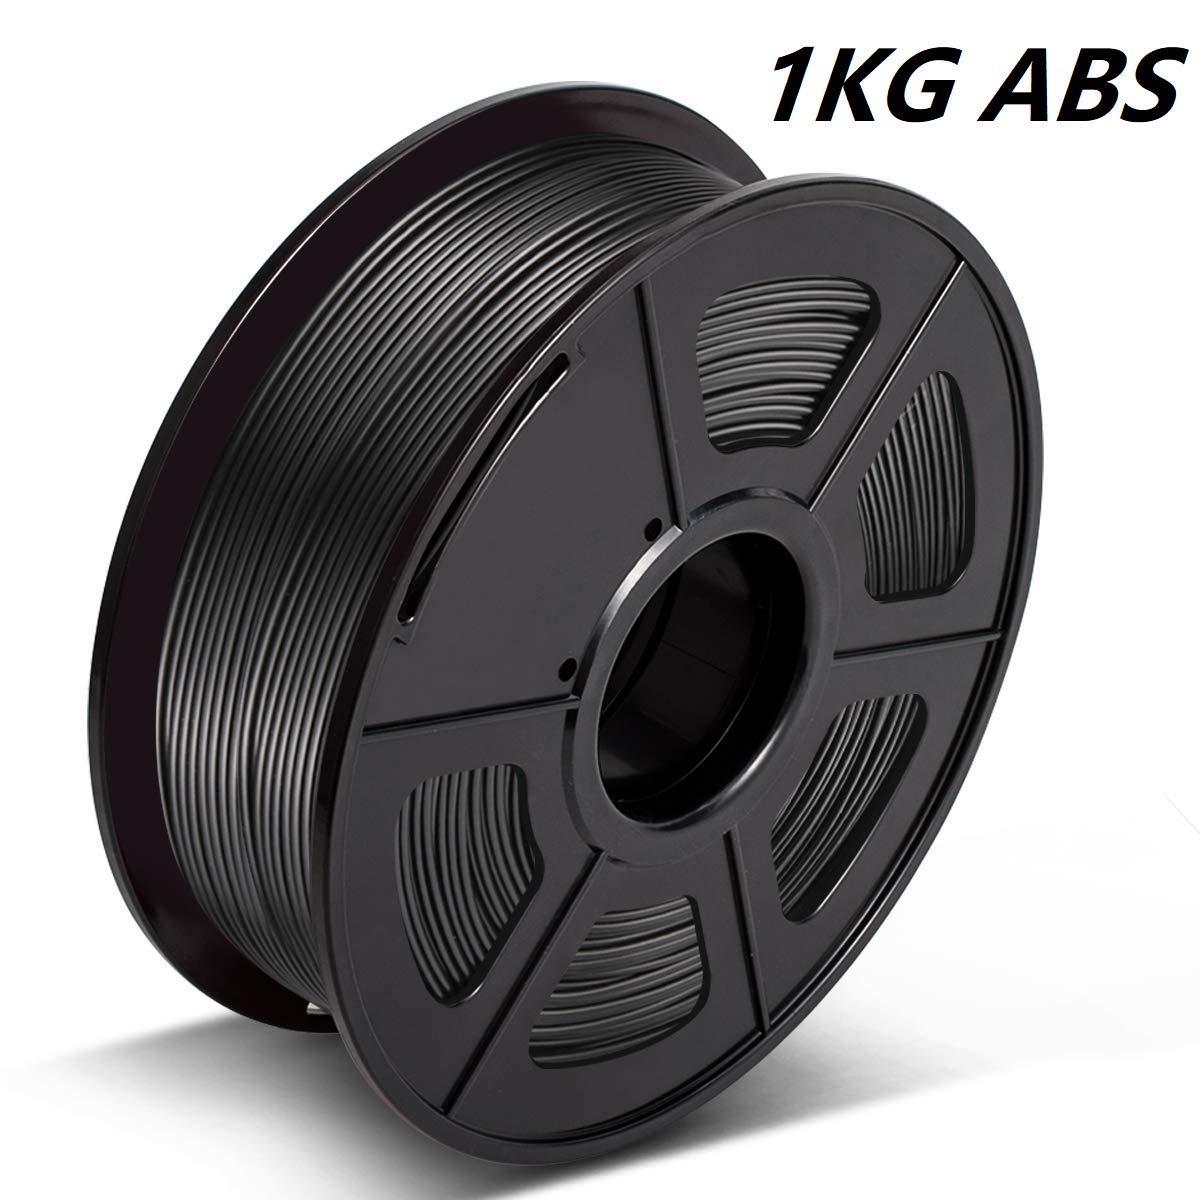 0.02mm,3D Printing Filament ABS Black,ABS Filament,1.75mm Filament // Dimensional Accuracy ABS Filament for 3D Printer,1KG Spool 3D Warhorse ABS Filament 1.75mm